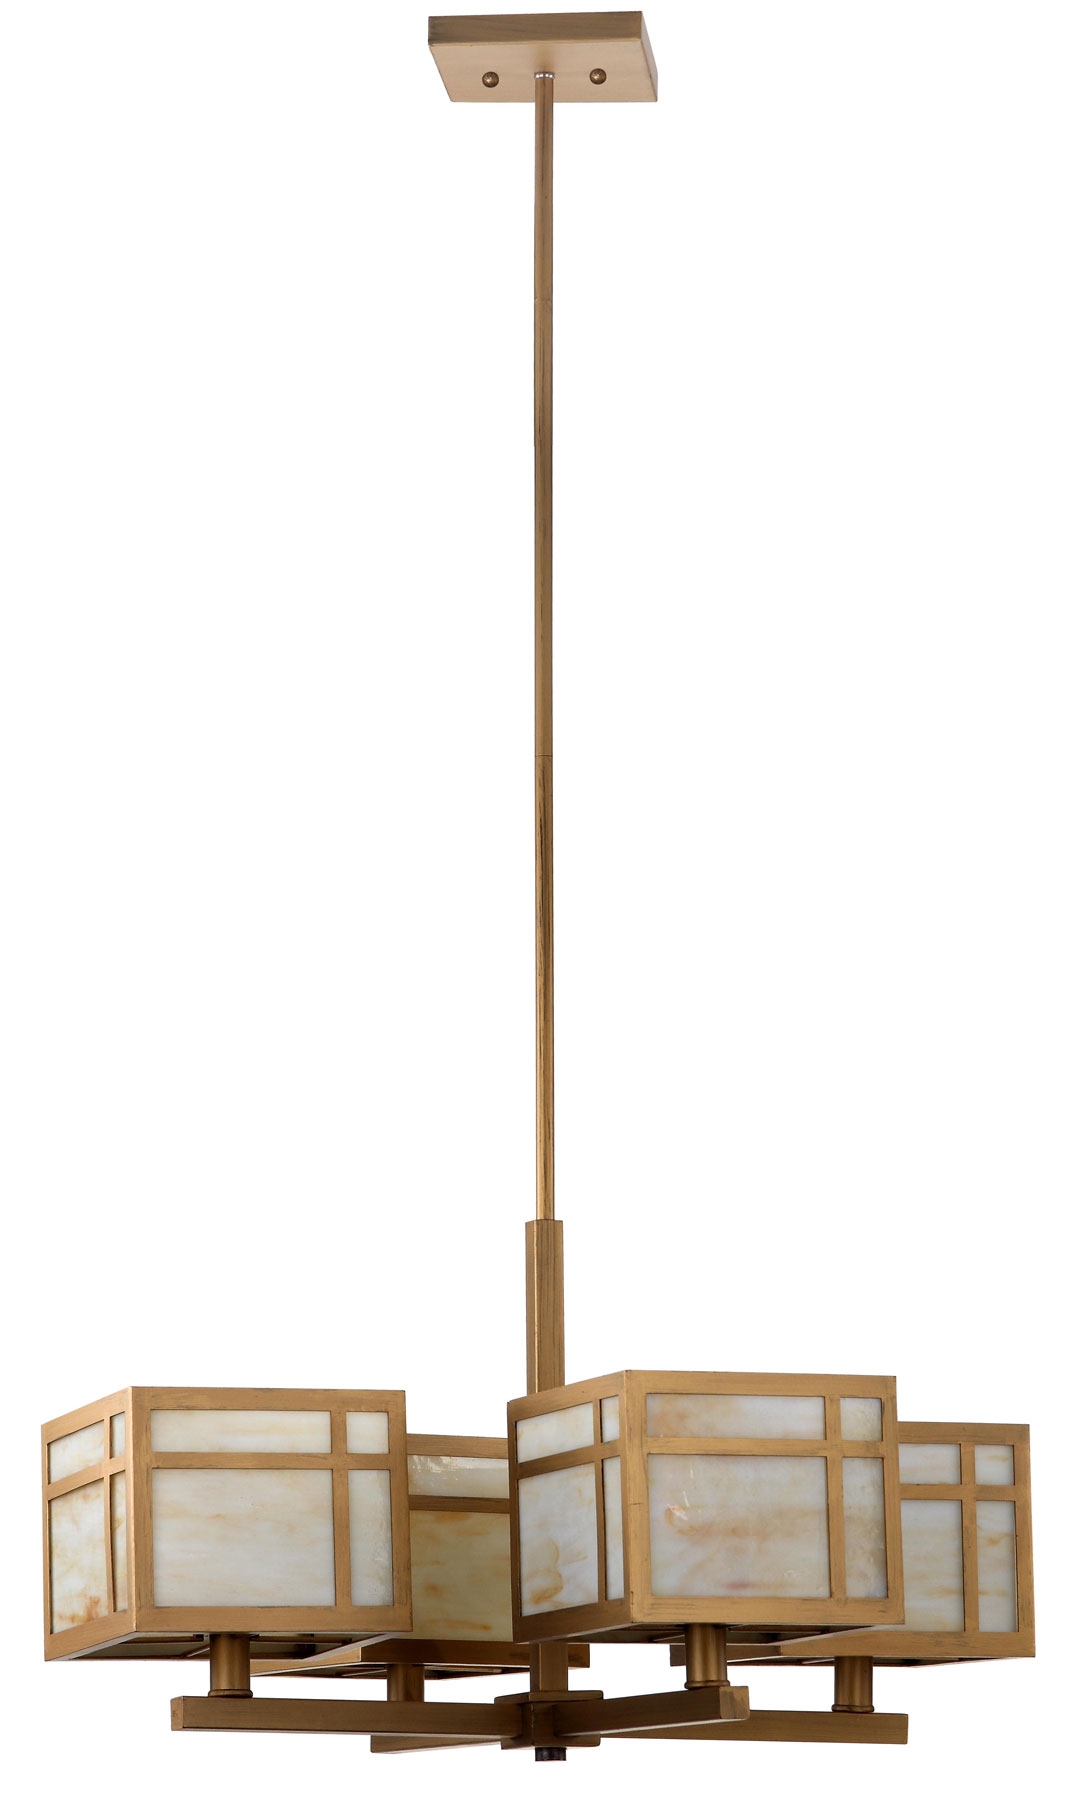 Lit4184a chandeliers lighting by safavieh craftsman 4 light antique gold 25 inch dia adjustable chandelier lit4184a aloadofball Images